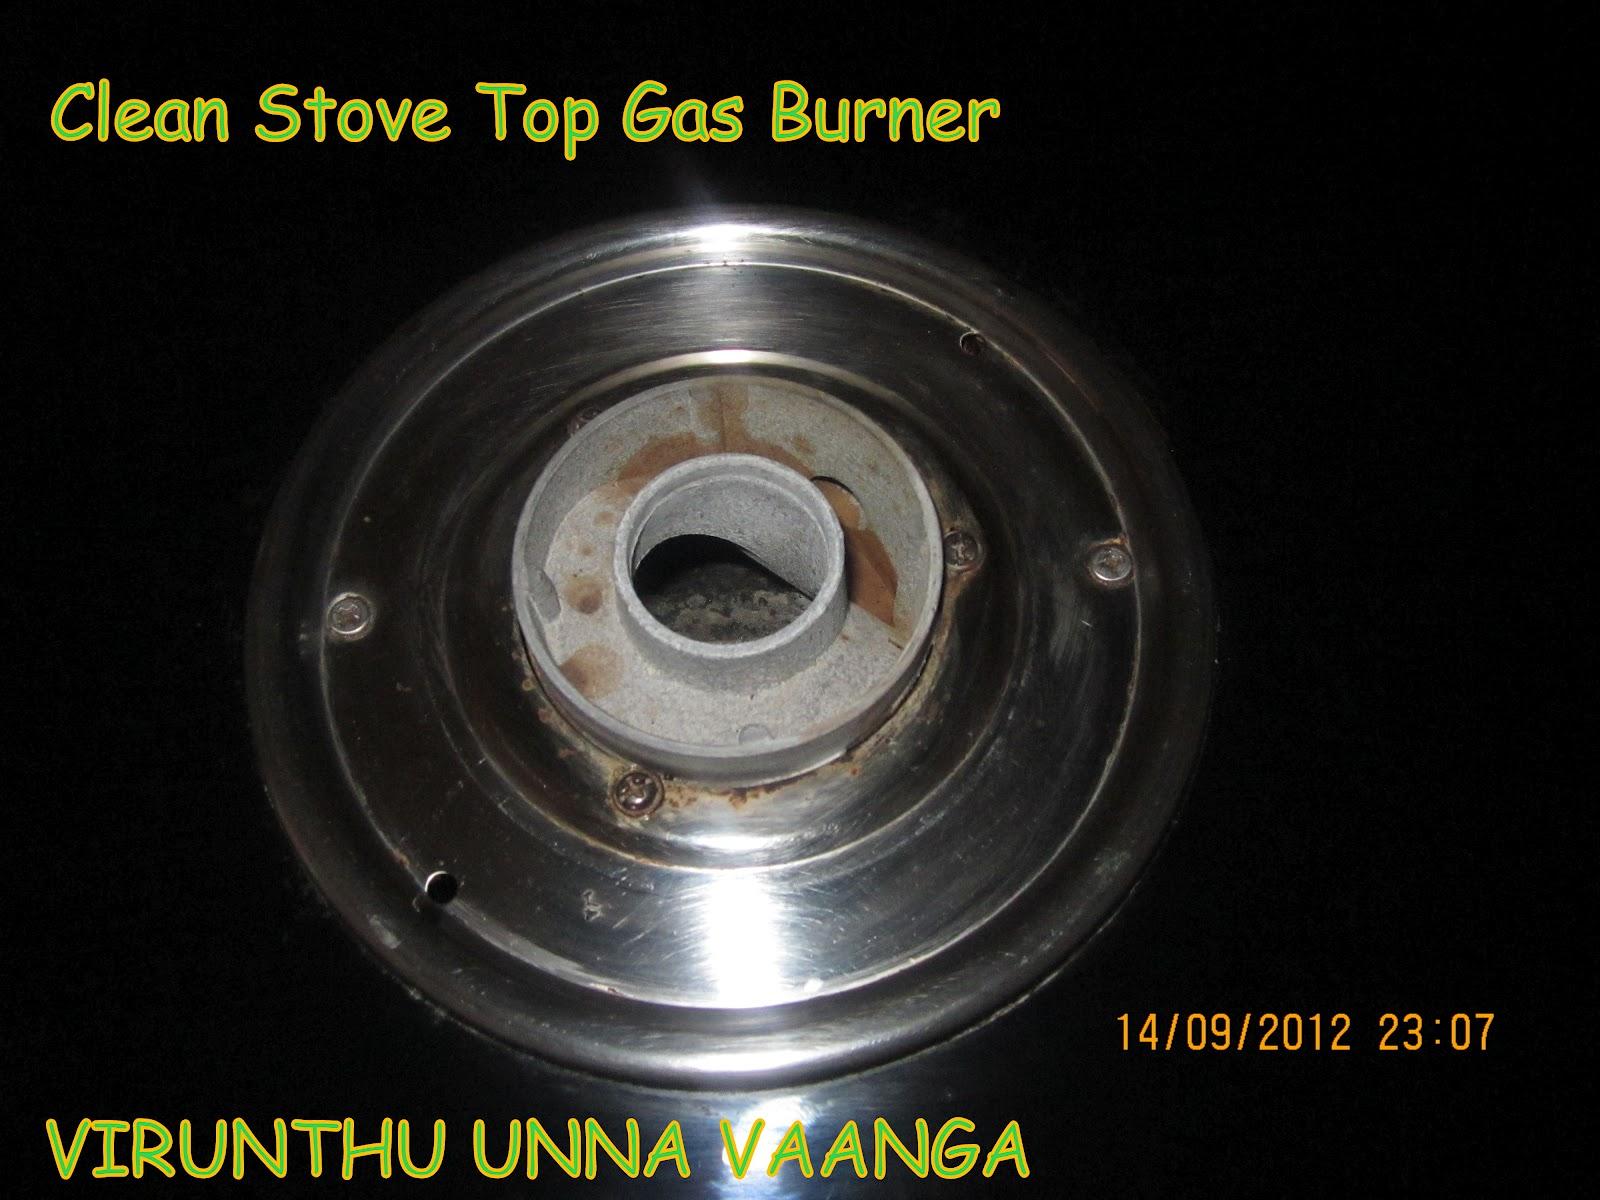 virunthu unna vaanga clean stove top gas burner. Black Bedroom Furniture Sets. Home Design Ideas